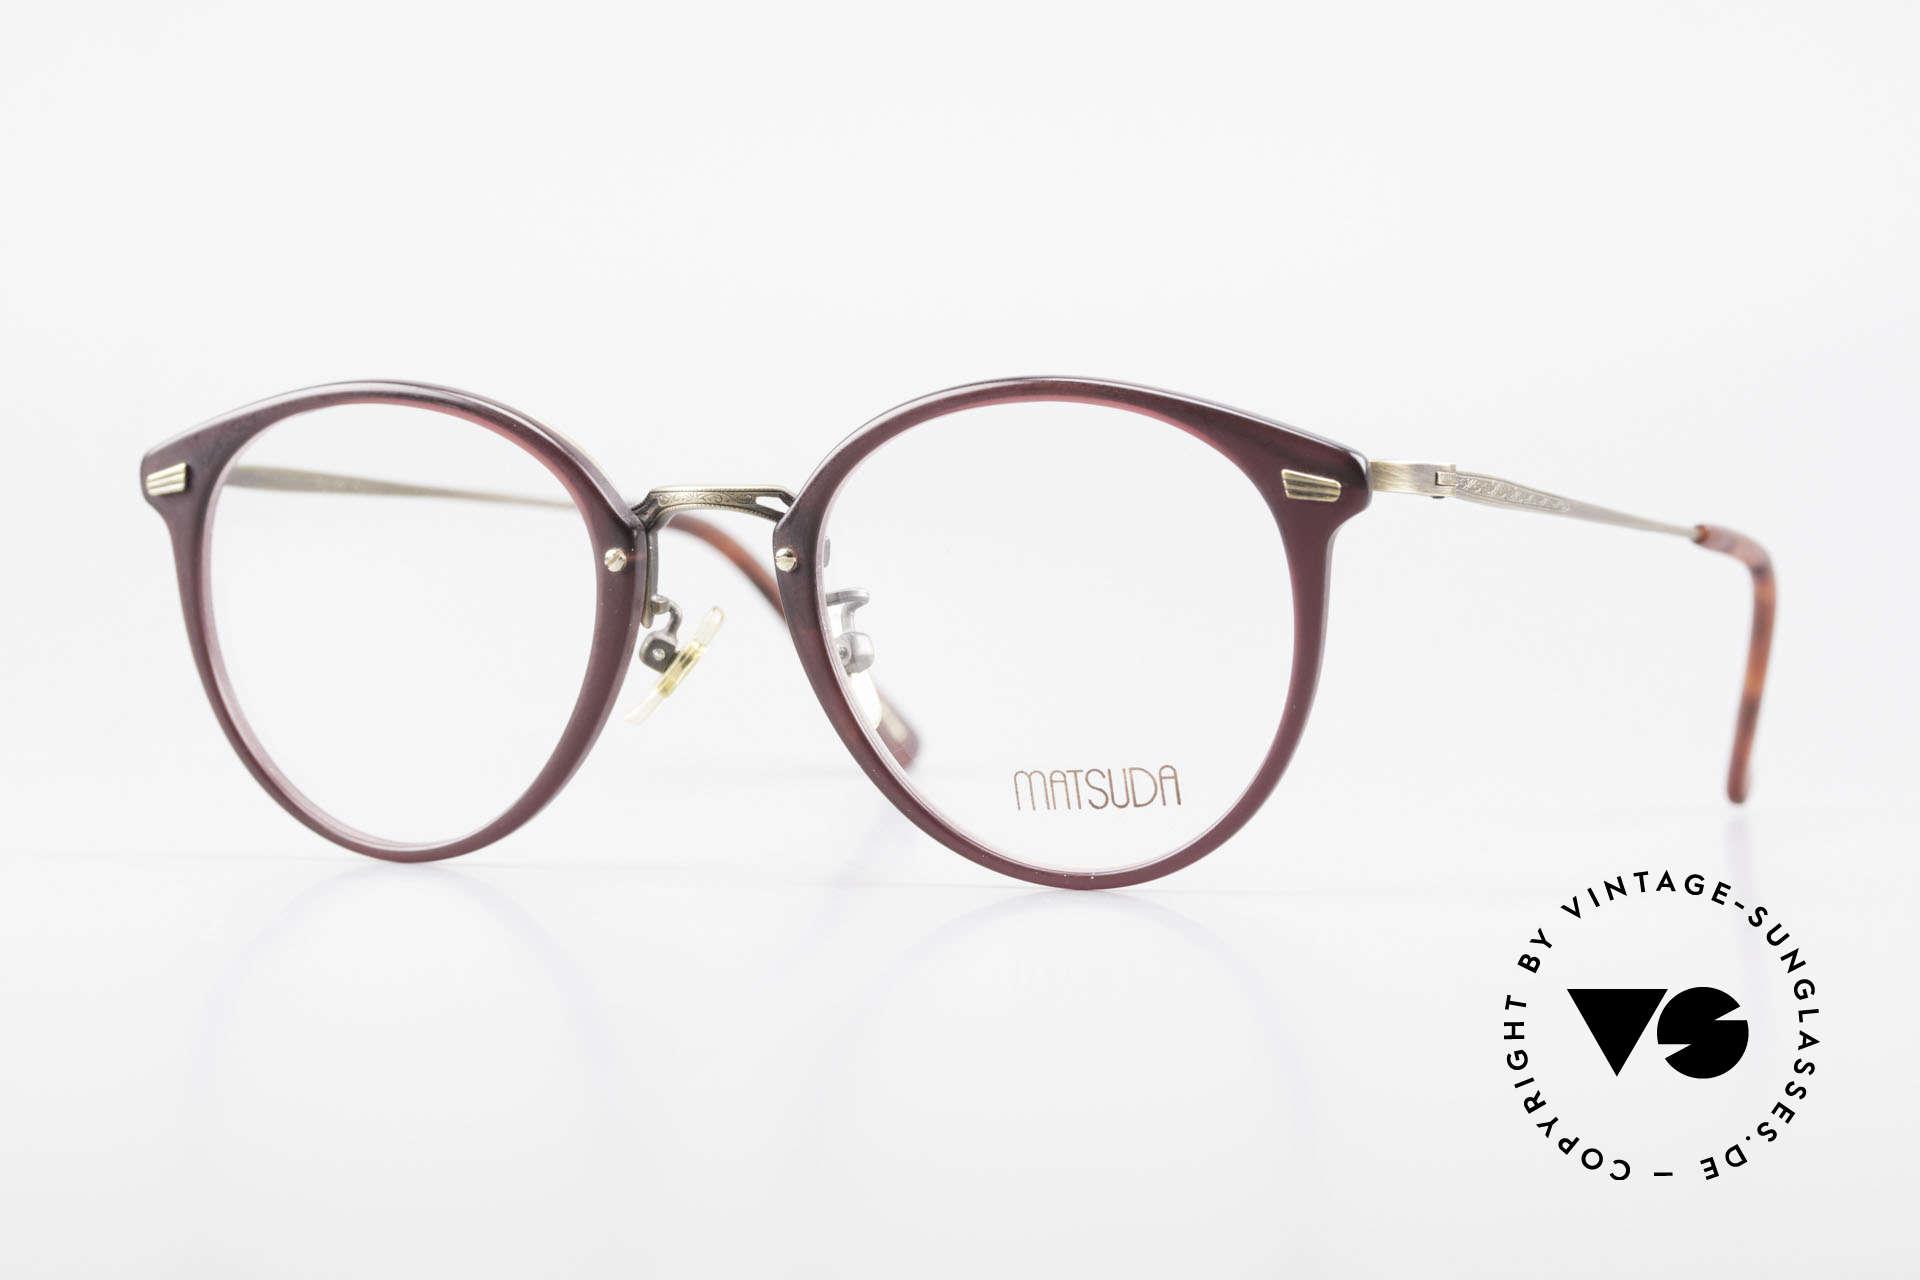 Matsuda 2836 Panto Style 90's Eyeglass-Frame, 90's vintage designer eyeglasses by Matsuda, Japan, Made for Men and Women